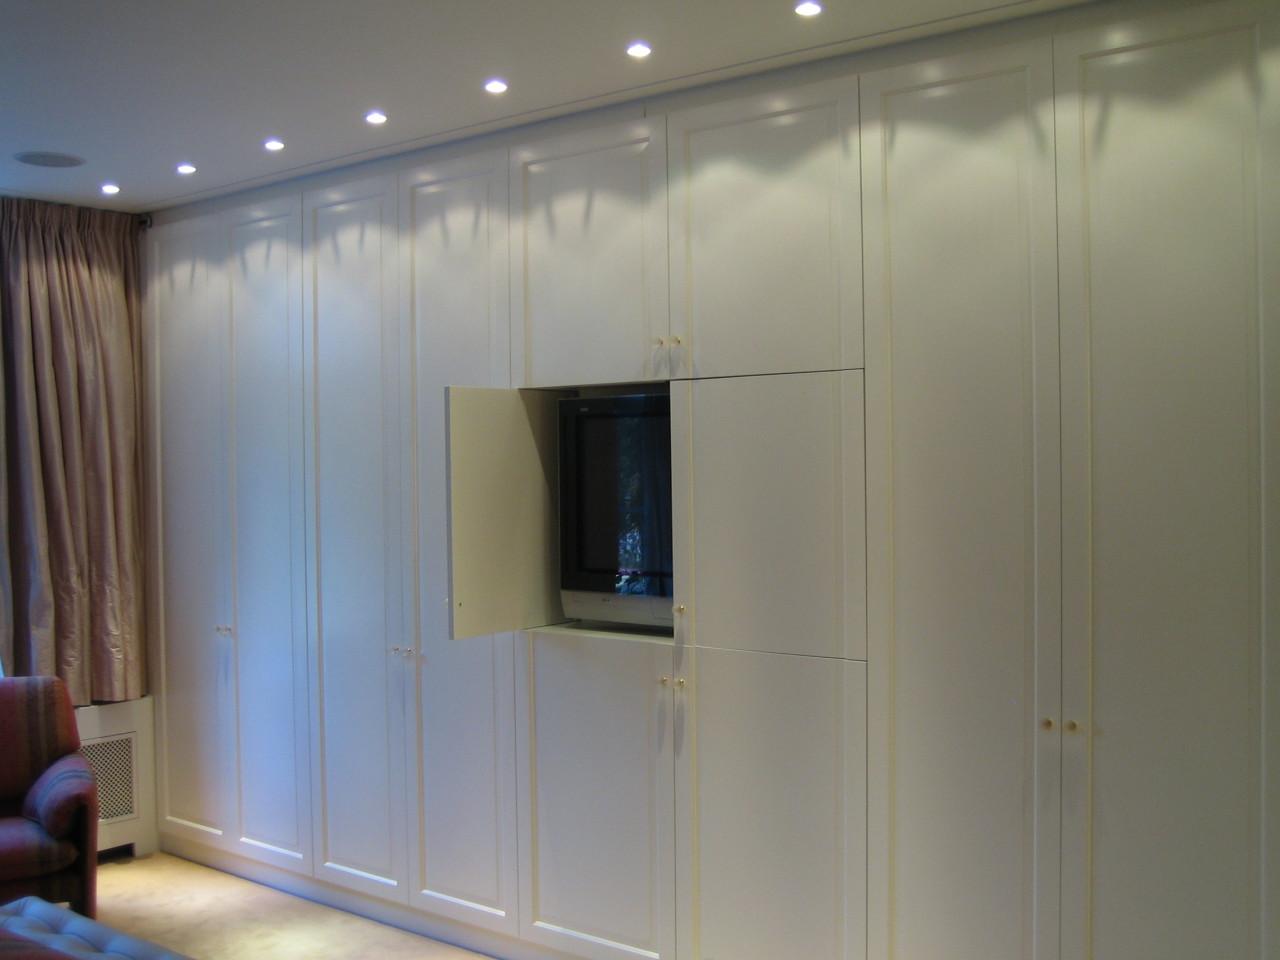 Slaapkamerkast dutch house design for Home designs newfoundland